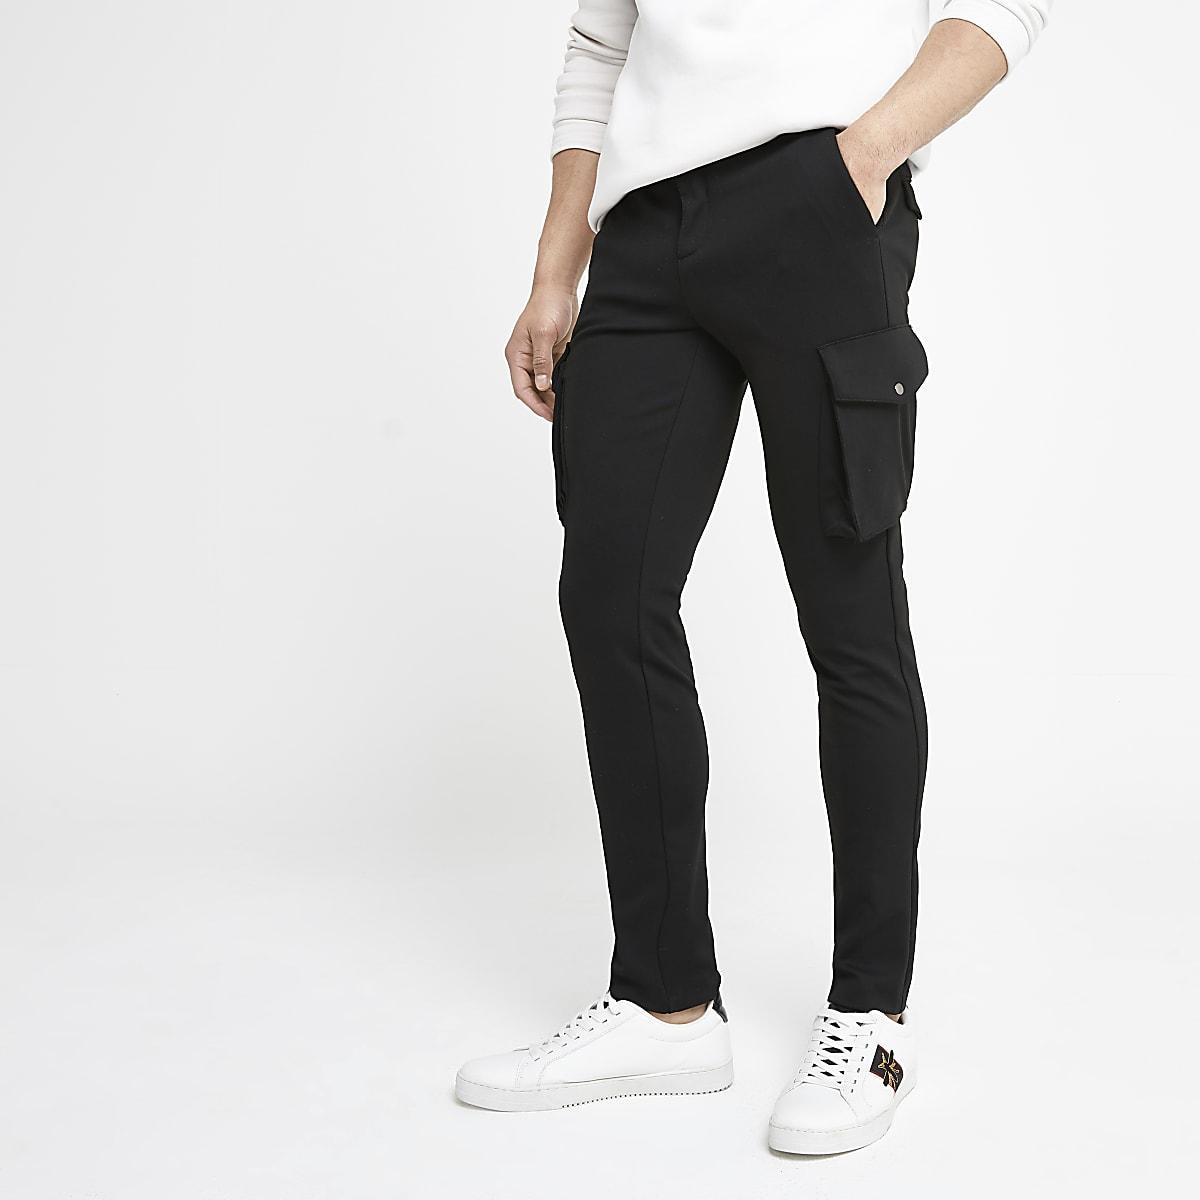 Black skinny smart cargo pants